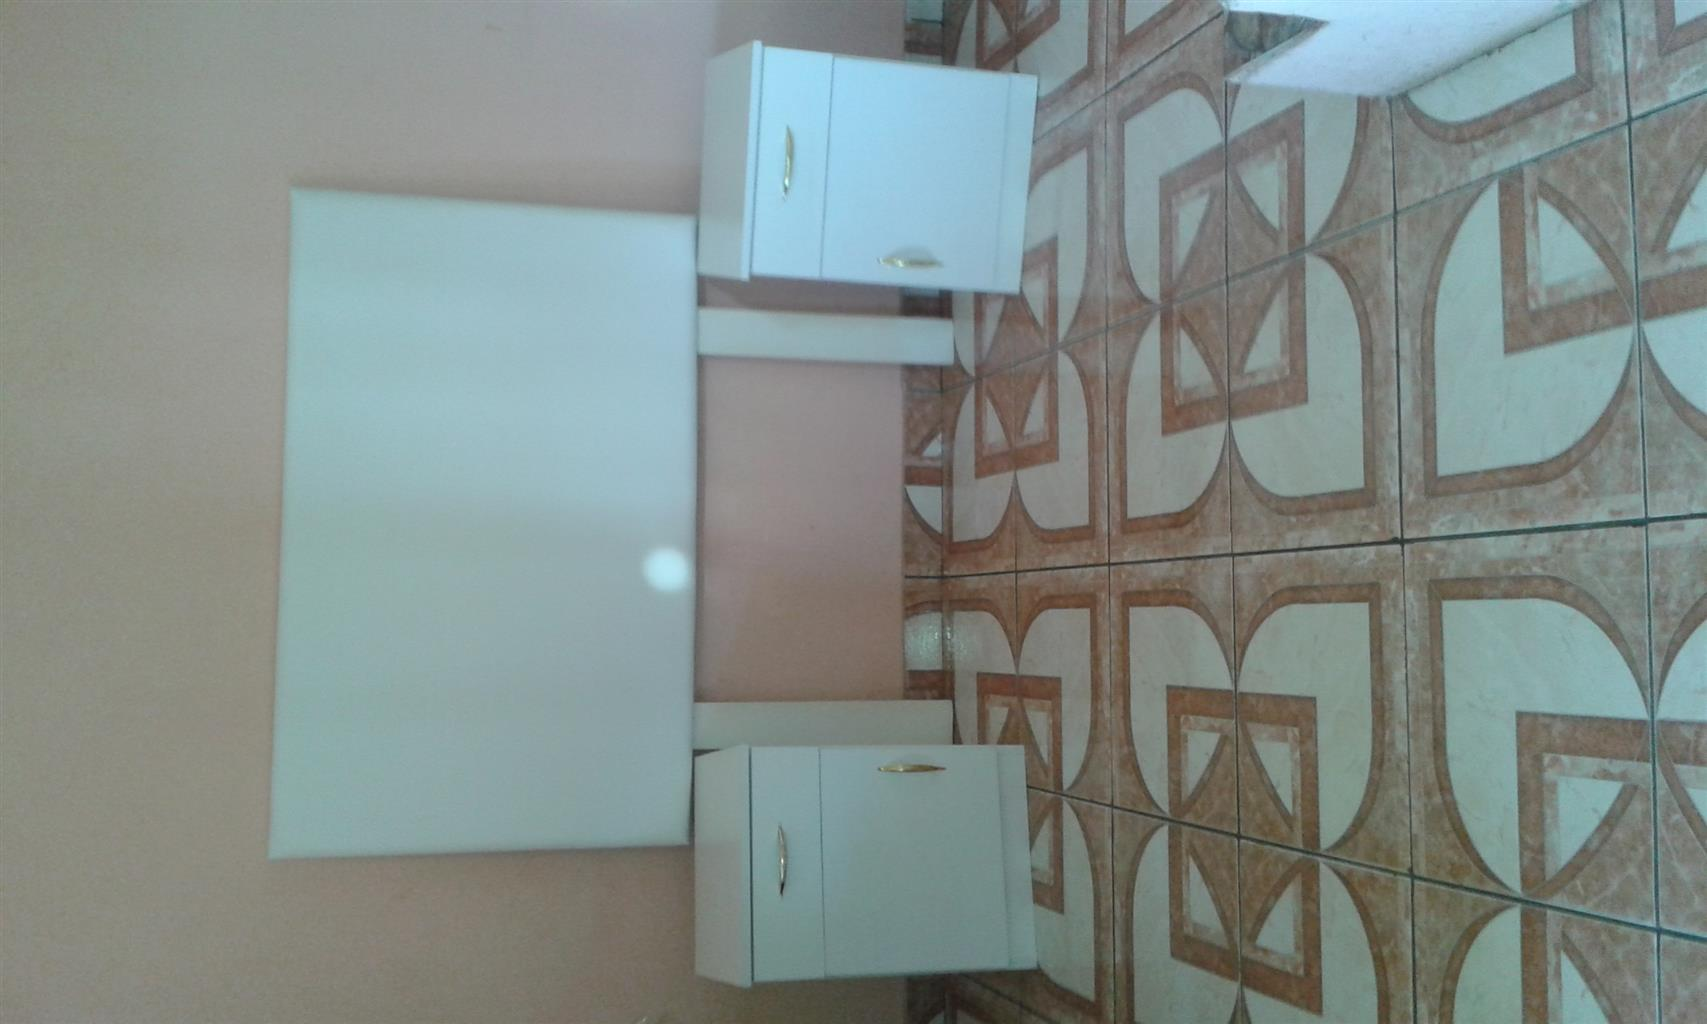 Designer furniture and appliances